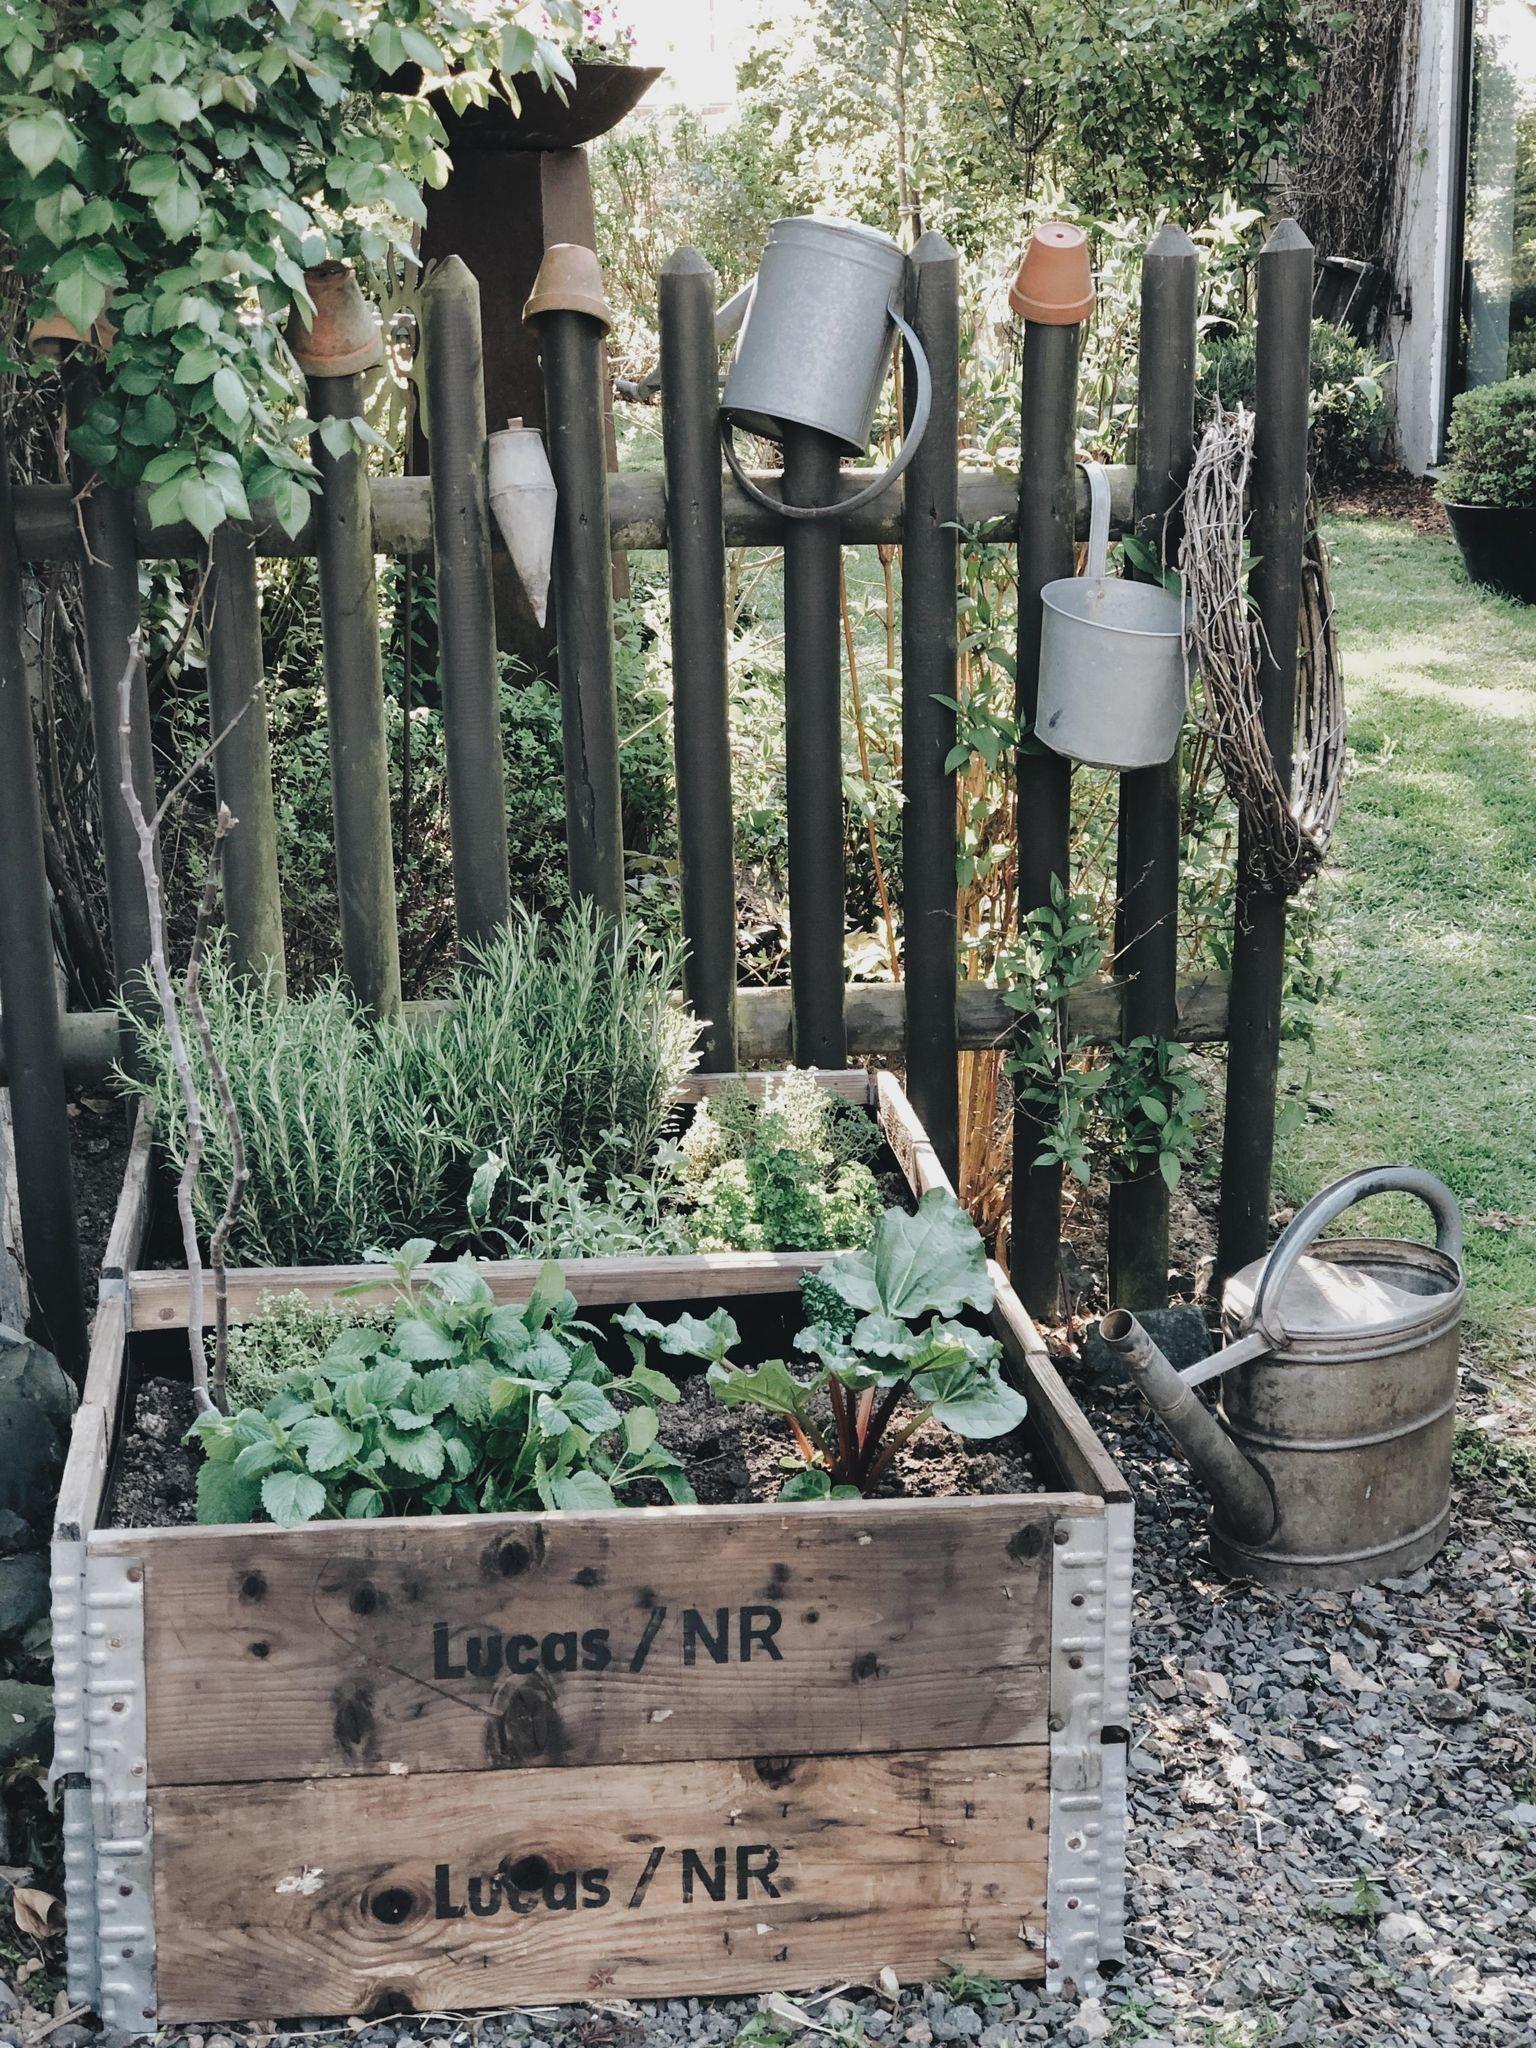 Garten Hochbeet Vintage Gartengestaltung Ideen Garten Gartengestaltung Hochbeet Garten Gartengestaltung In 2020 Garden Design Garden Care Indoor Garden